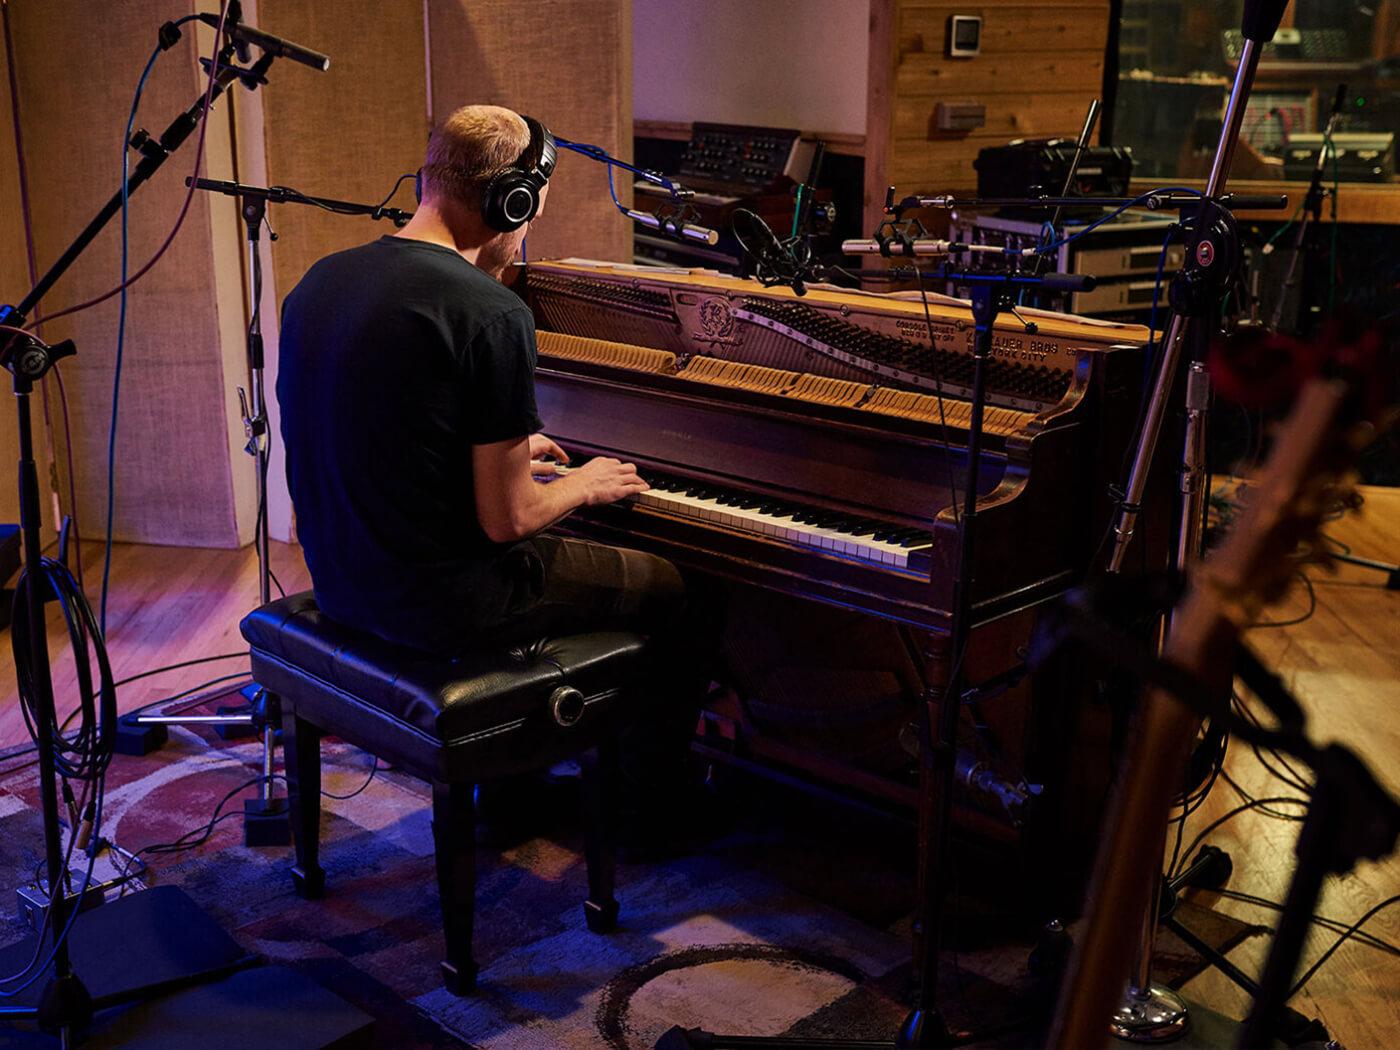 Spitfire Audio Firewood Piano